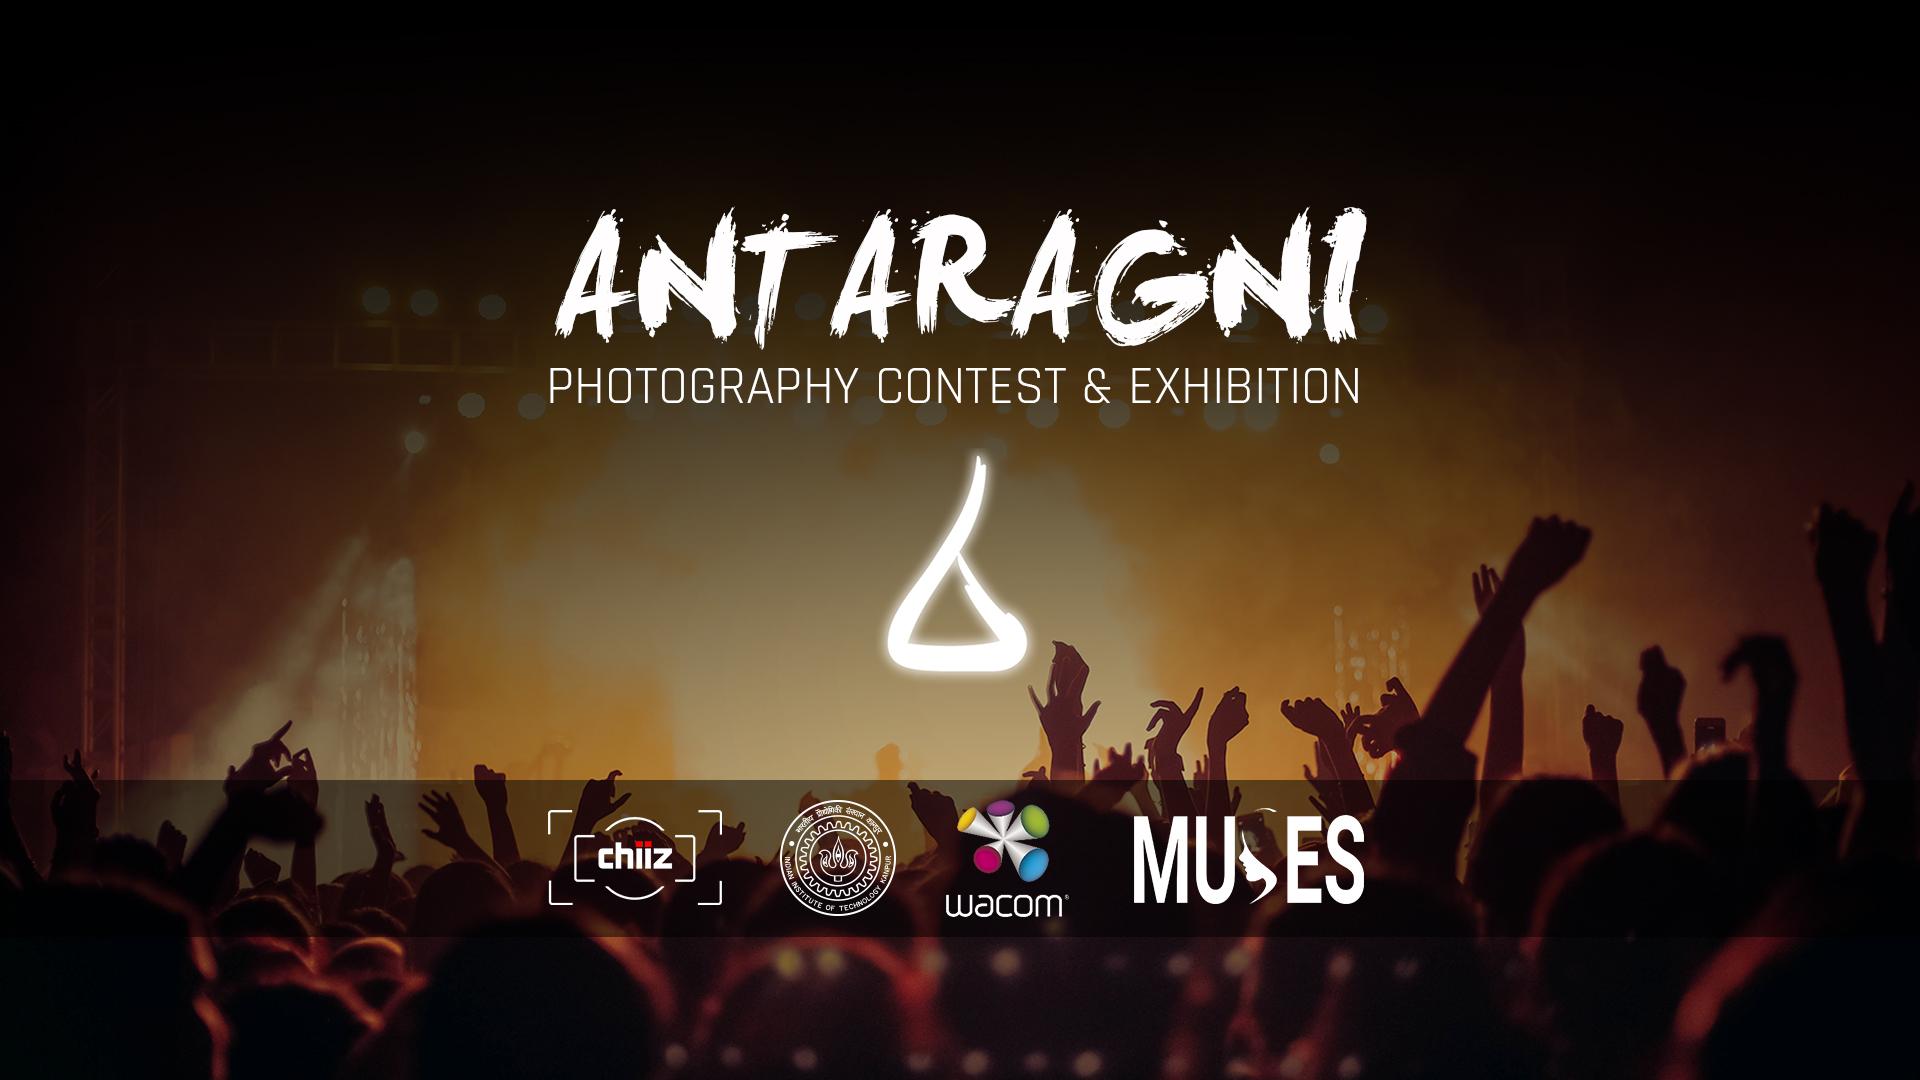 Antaragni Photography Contest